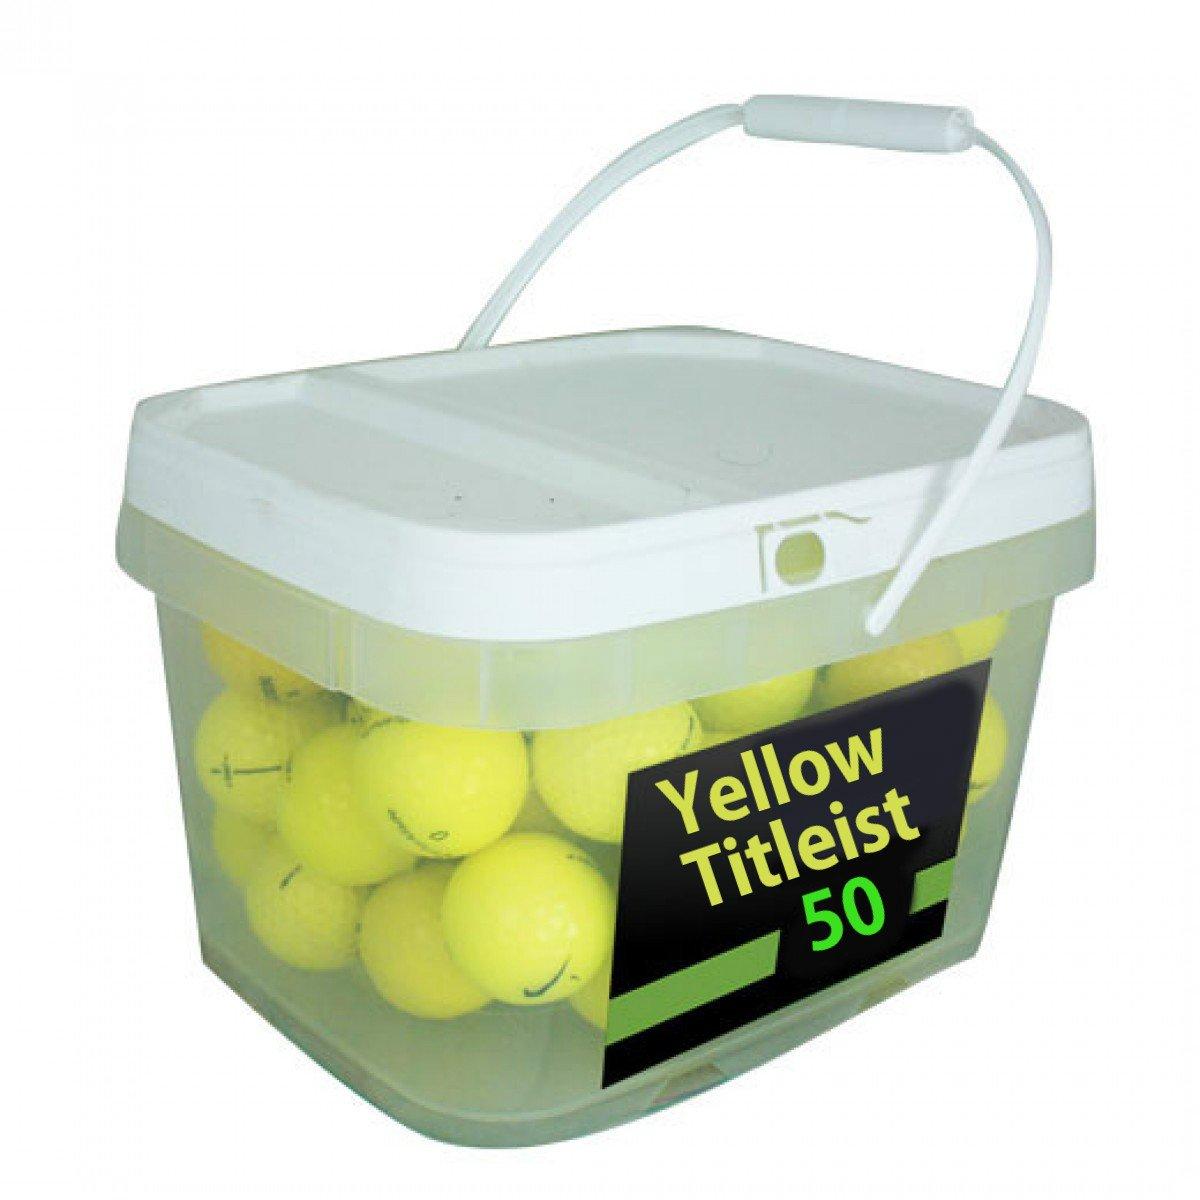 Titleist Yellow Premium Golf Balls (50 Pack)